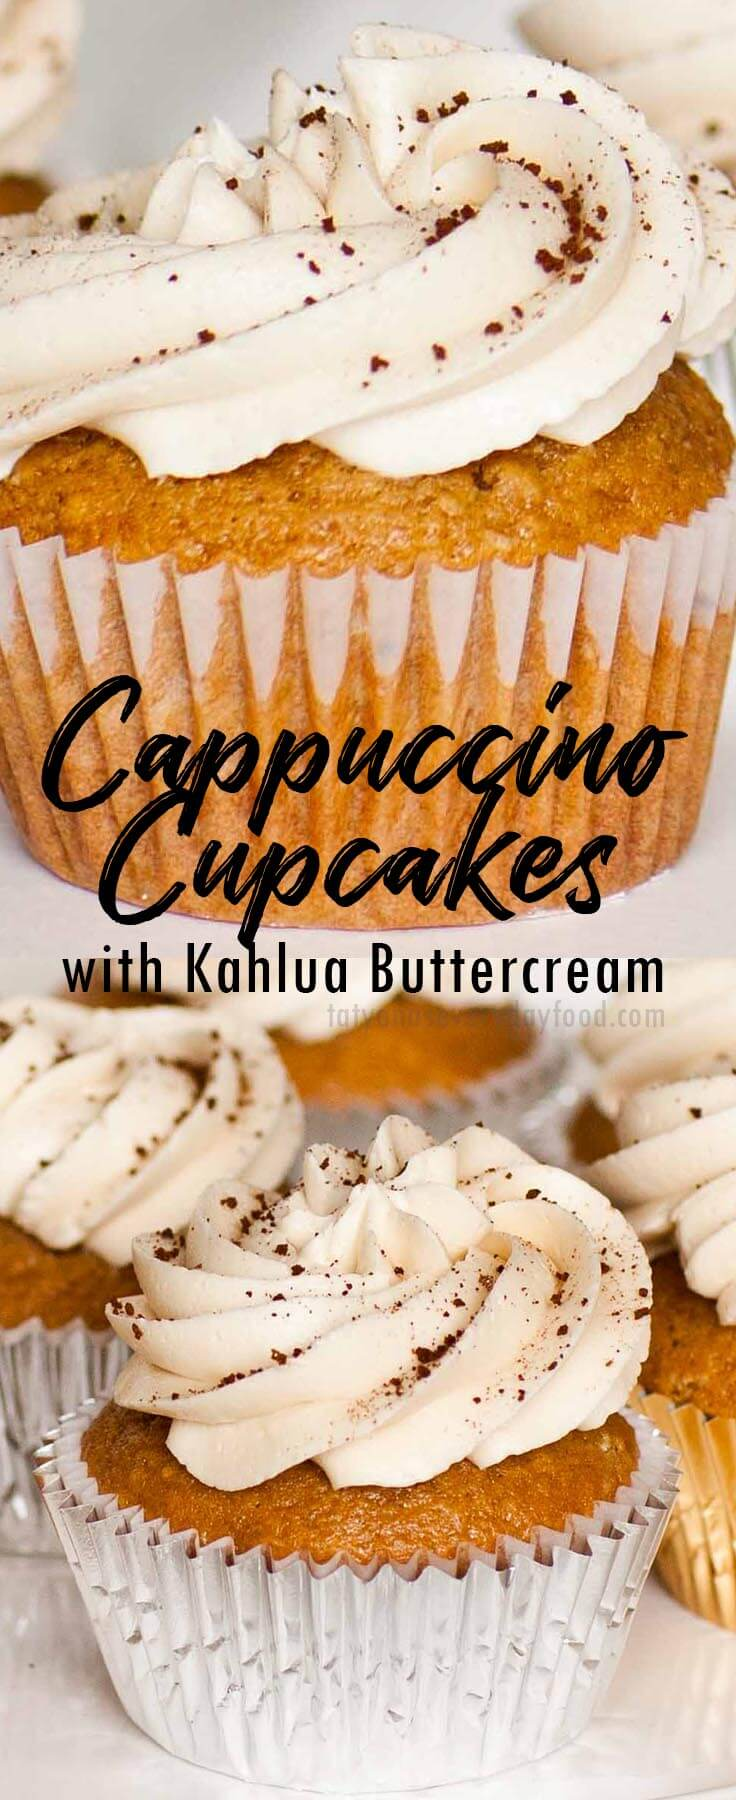 Cappuccino Cupcakes video recipe